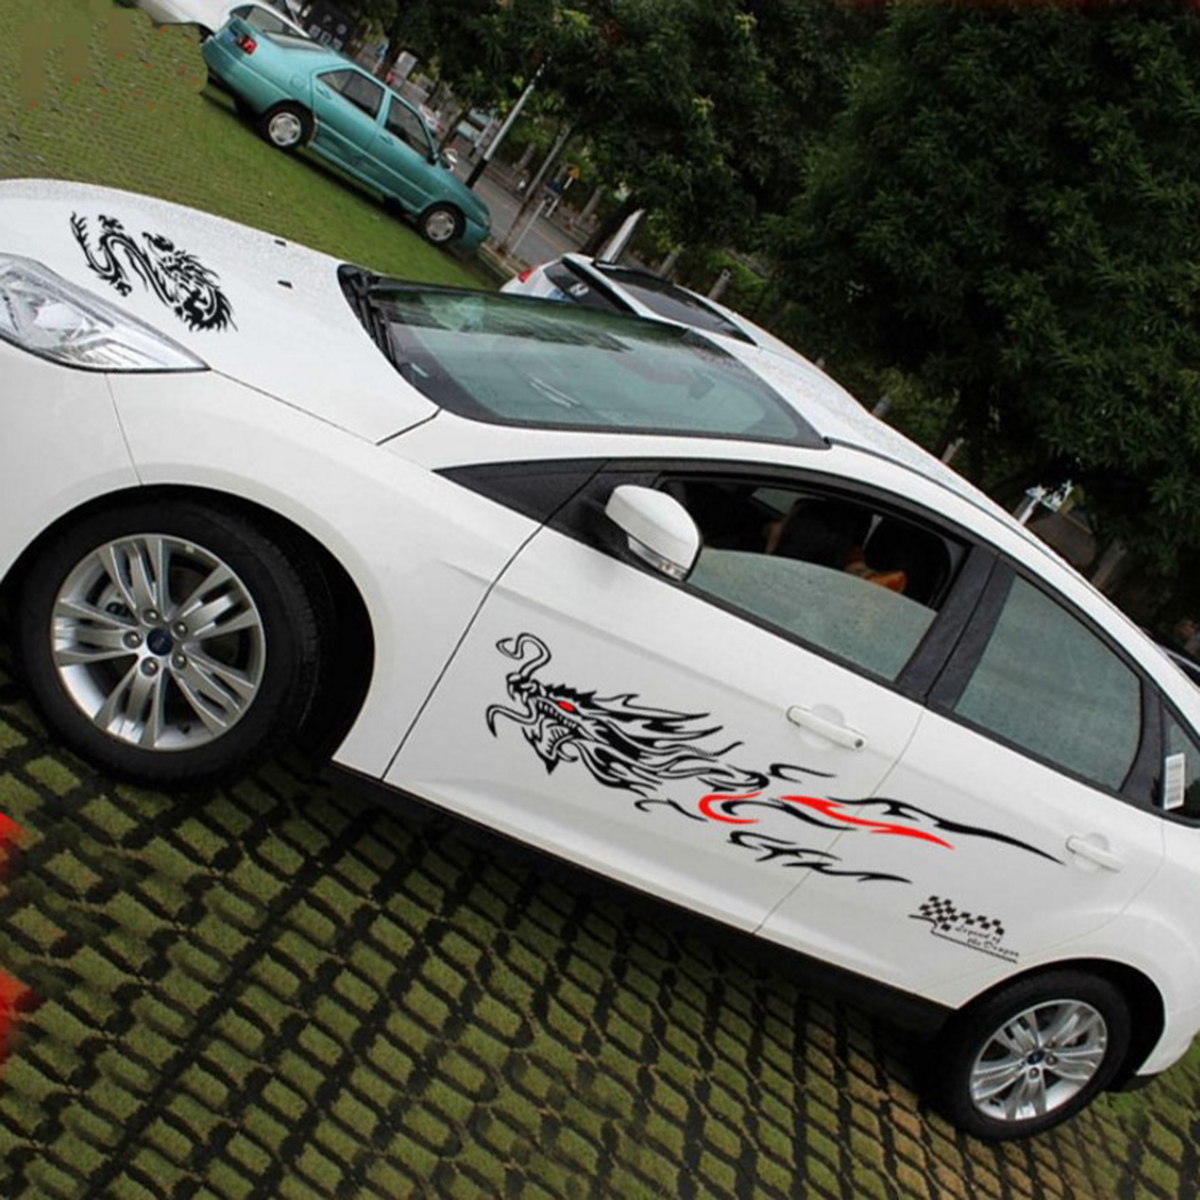 Chinese totem dragon graphics side decal body hood car stickers for chevrolet hyundai vw subaru volvo